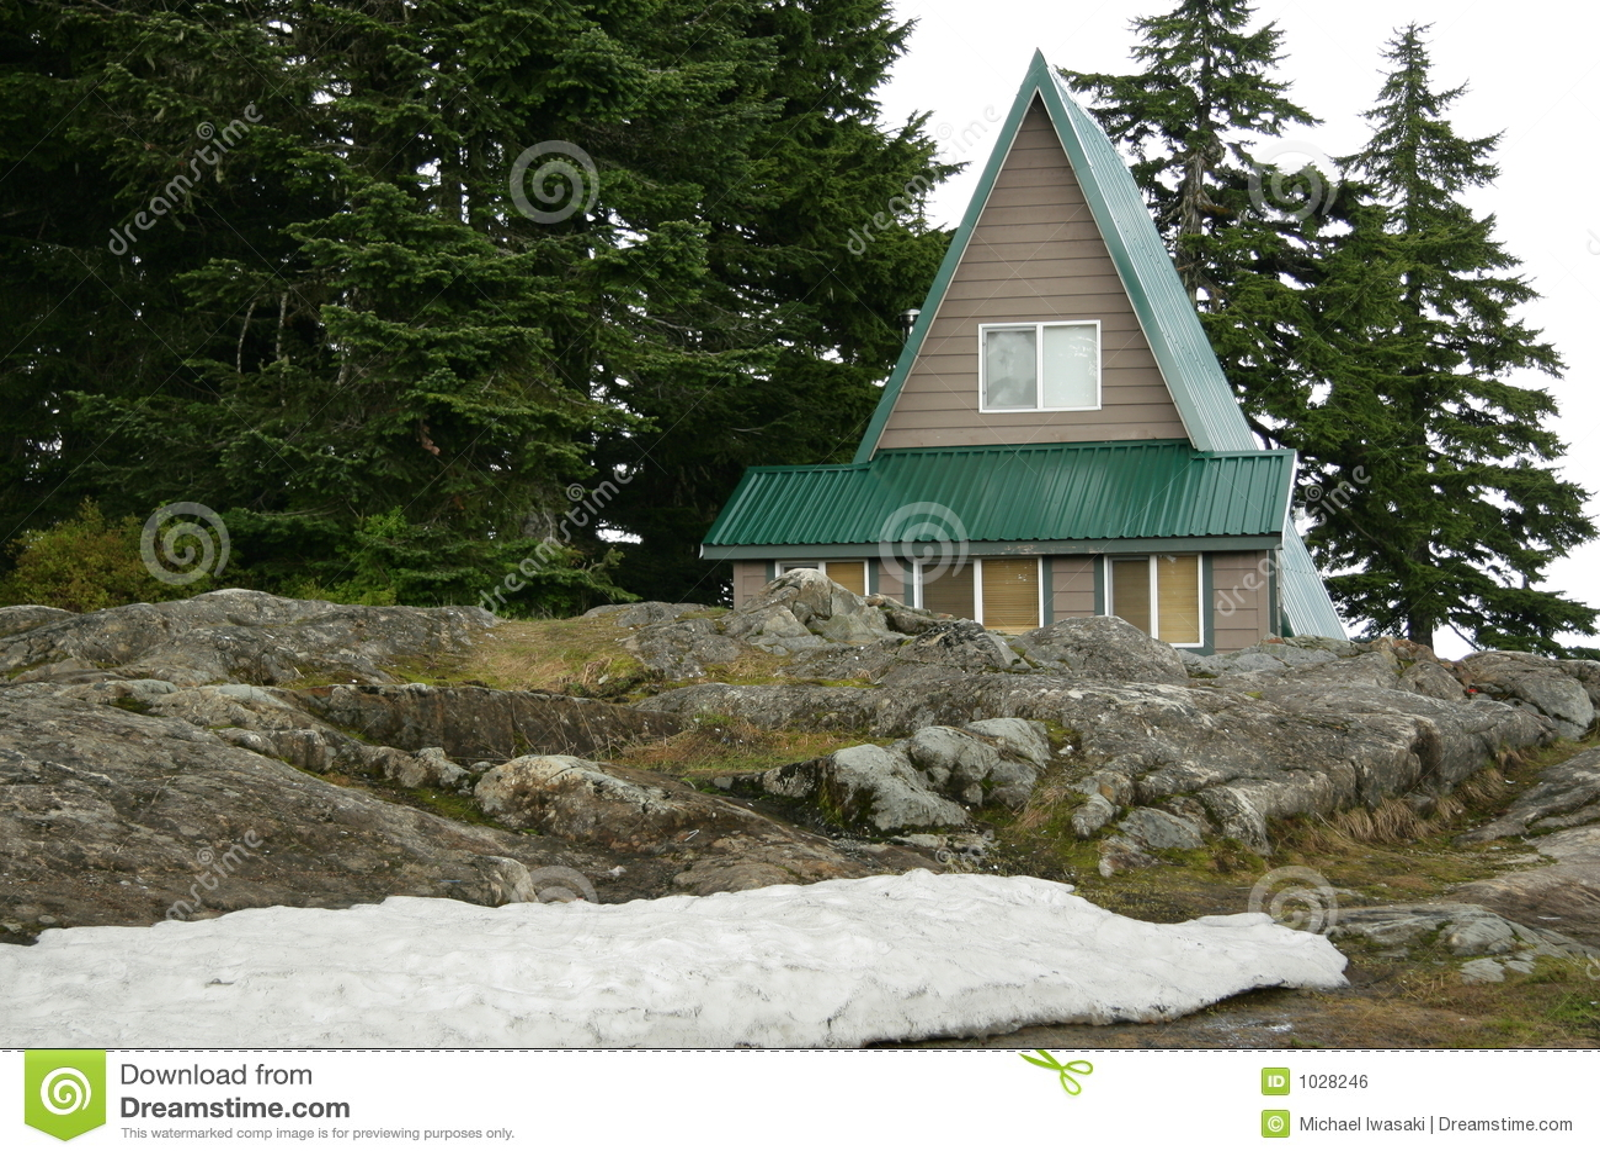 cabine en montagne photo stock image du ressource ForCabine Remote Fumose Montagne